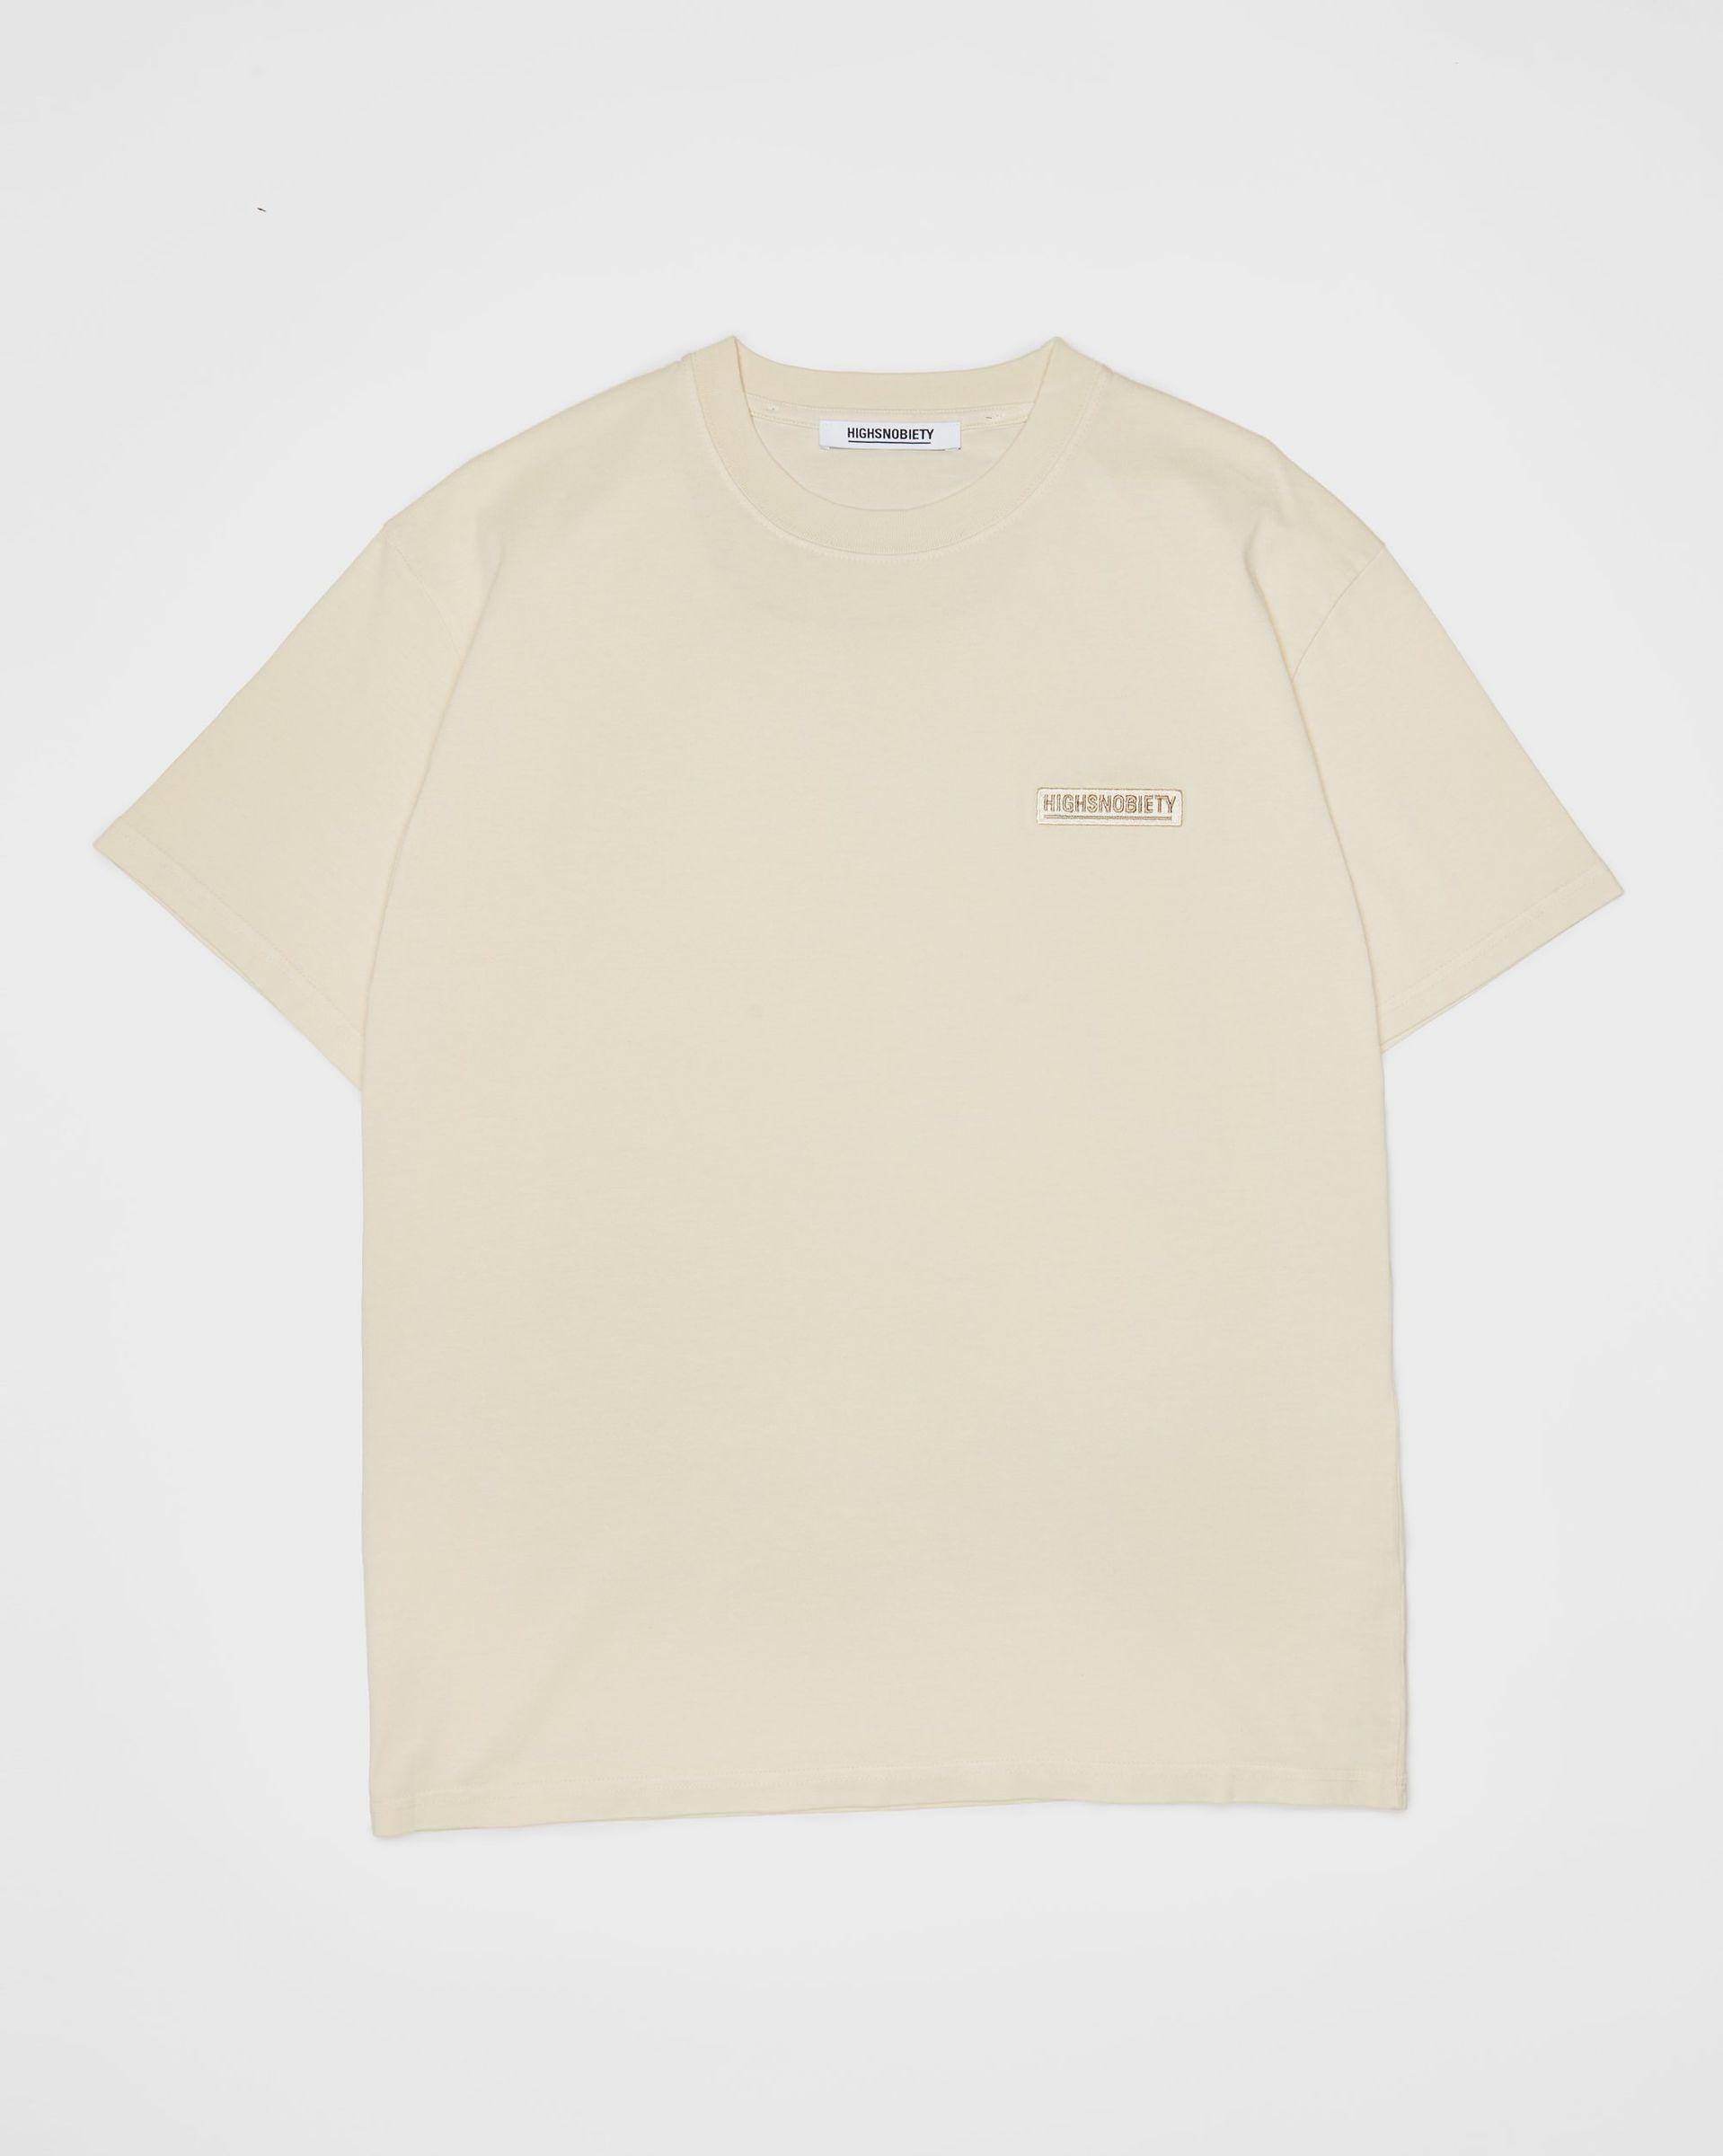 Highsnobiety Staples - T-Shirt Eggshell - Image 1